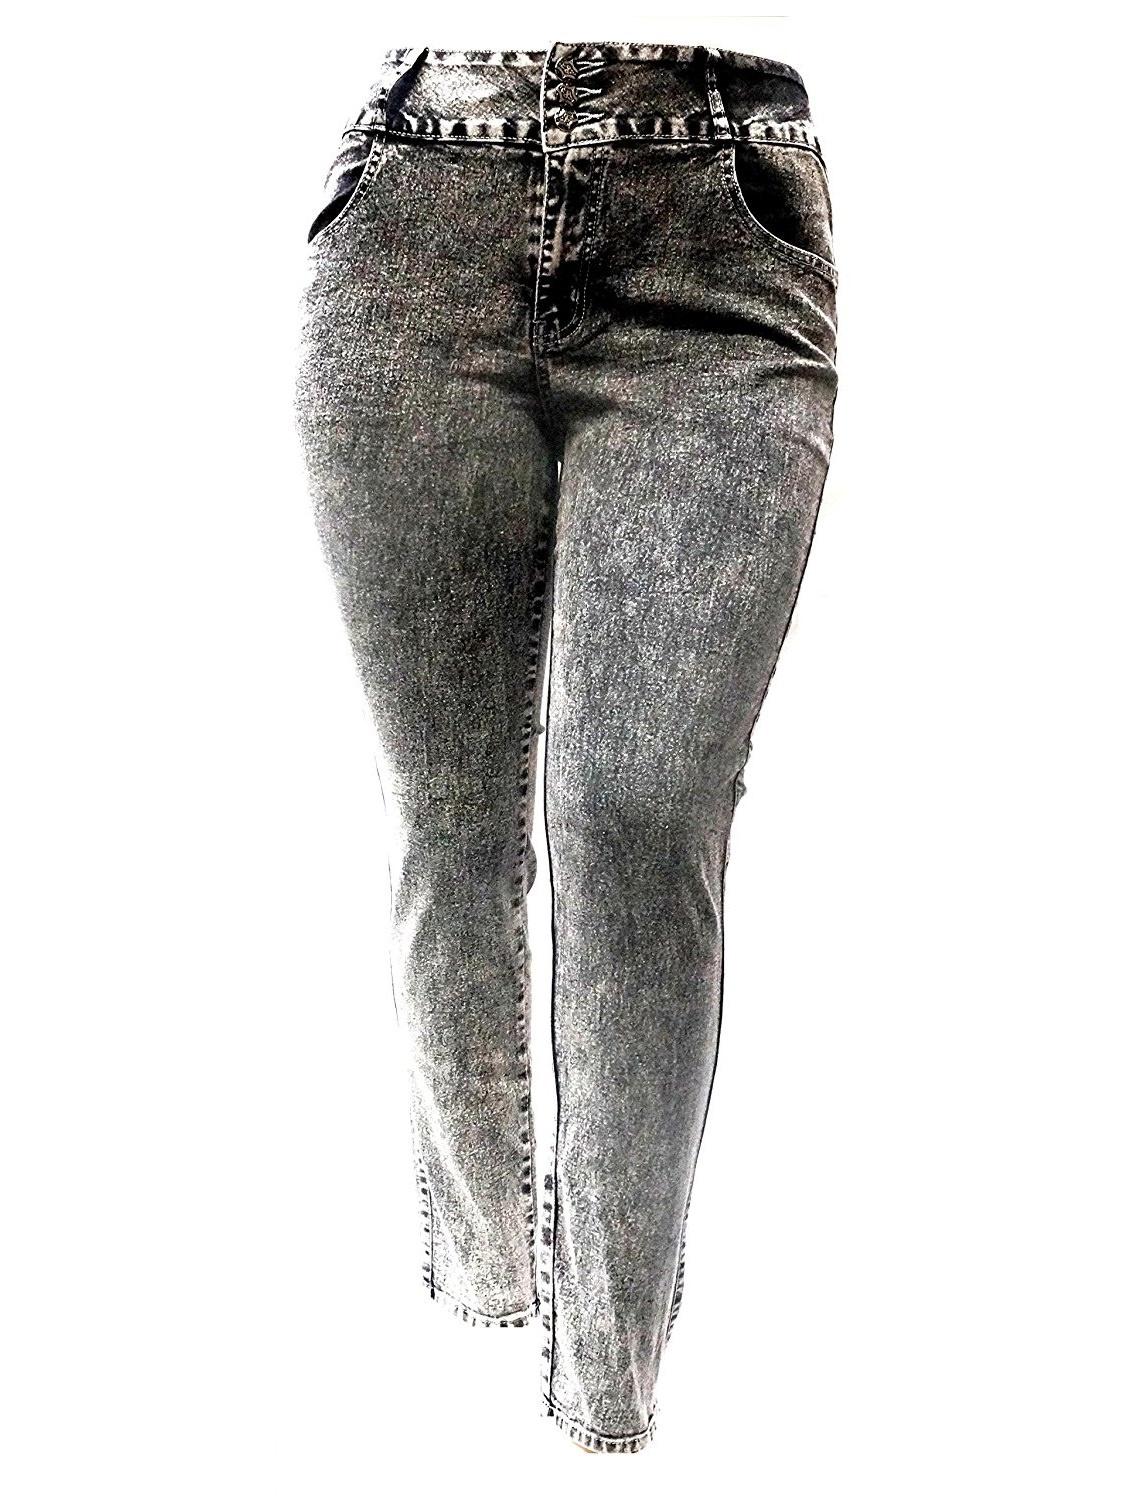 Jack David Stretchy BLACK denim jeans HIGH WAIST WOMENS PLUS SIZE pants SKINNY LEG Y1672A